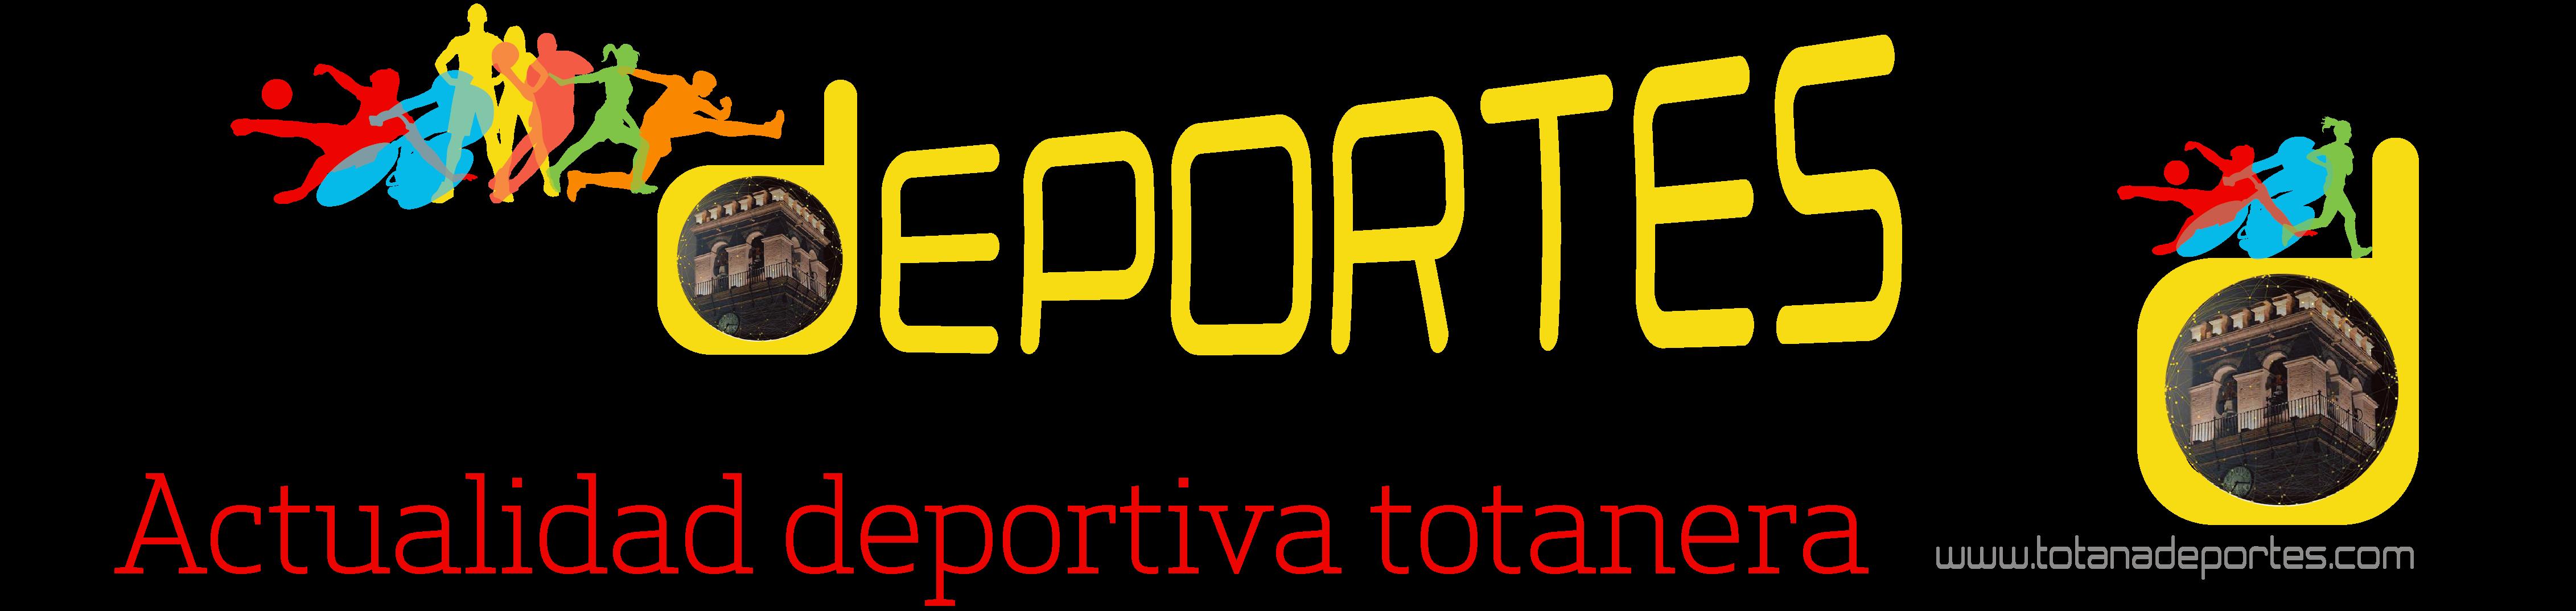 Totana Deportes